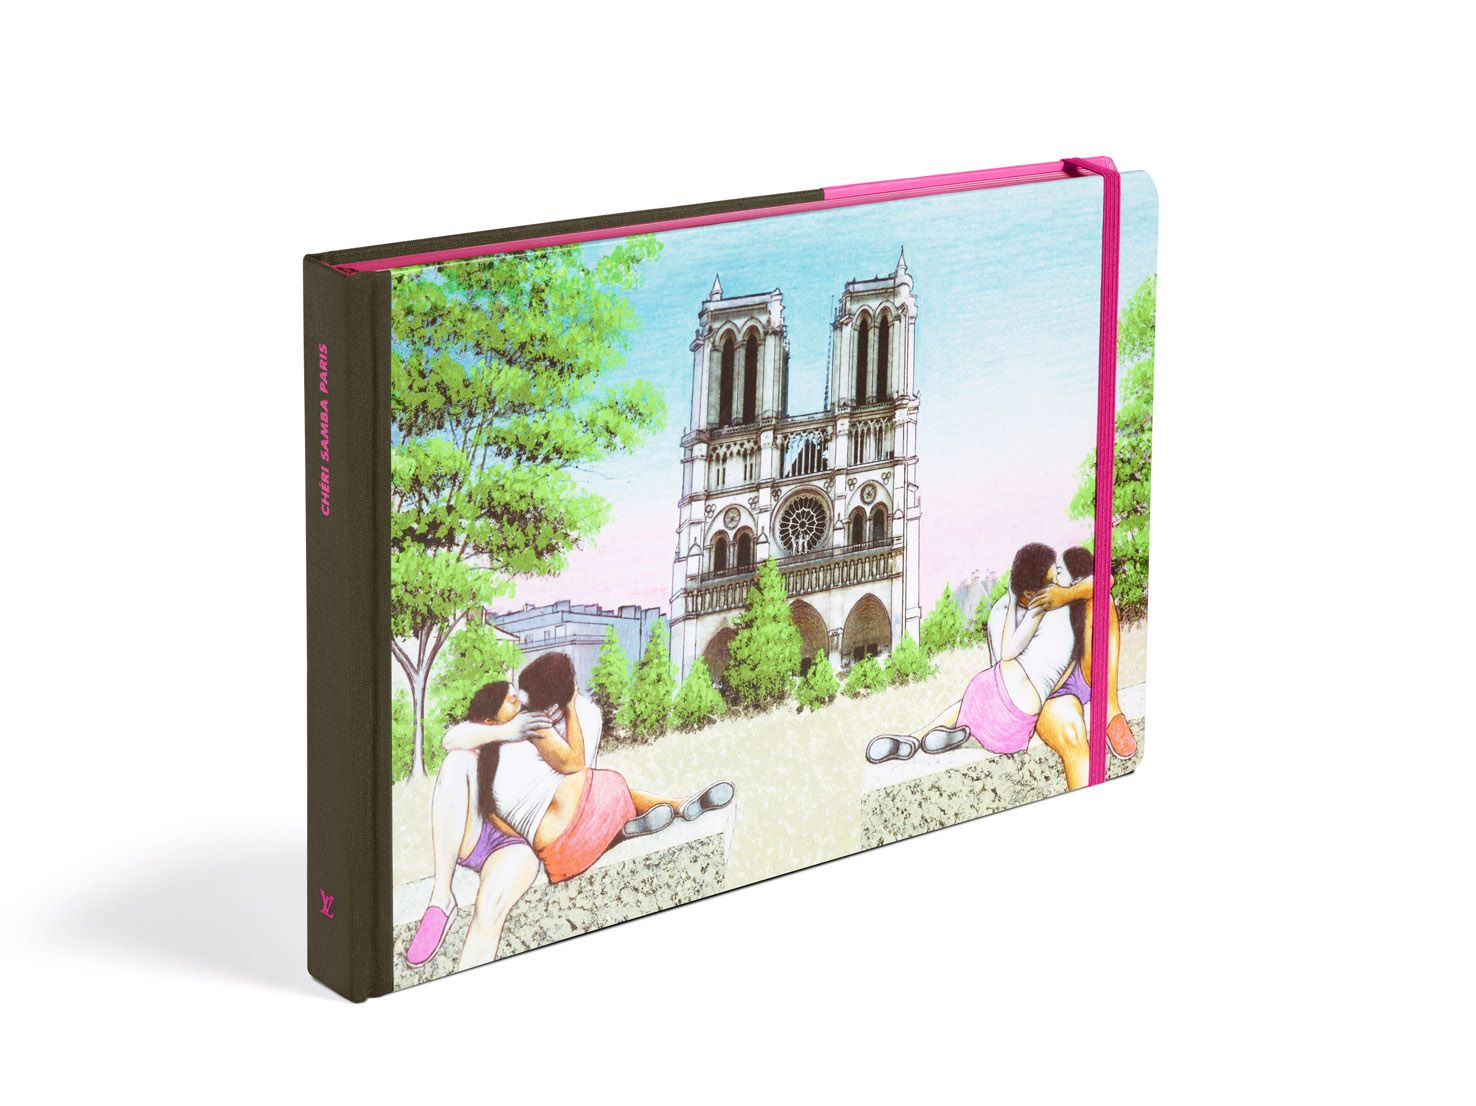 Louis Vuttion Travel Book 2013, Paris Illustrated by Cheri Samba